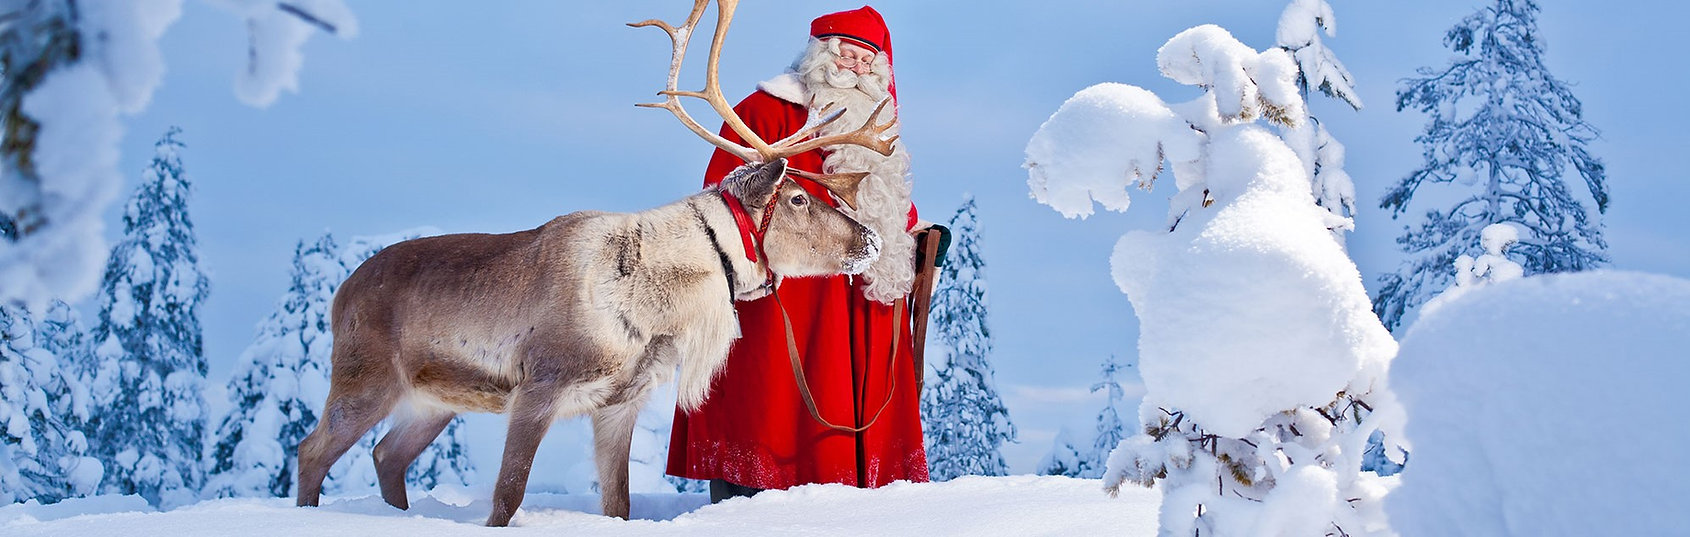 visit-rovaniemi-santa-claus-reindeer-sno